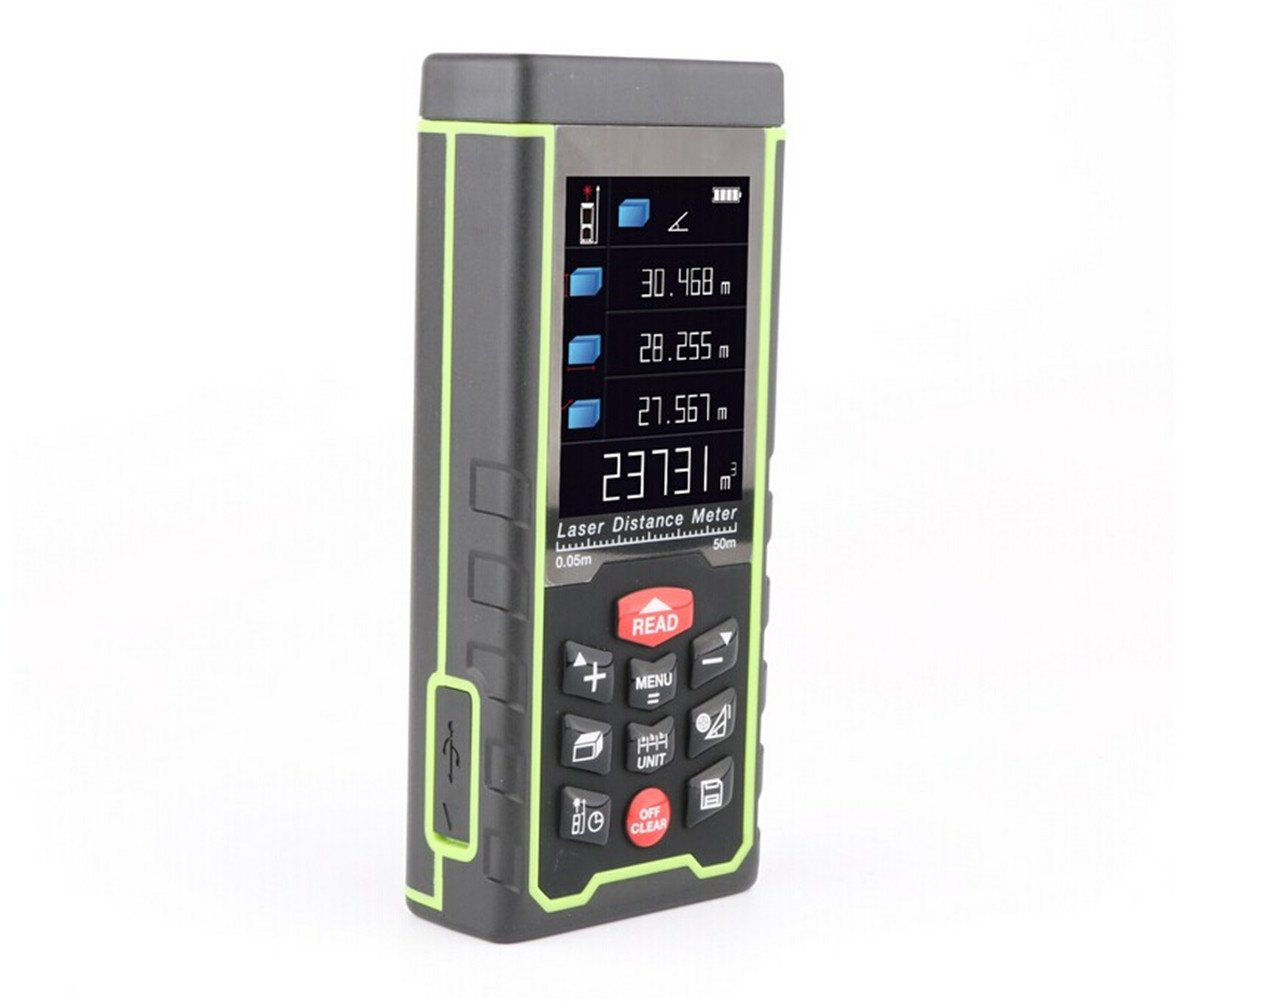 Kaleas Profi Laser Entfernungsmesser Ldm 500 60 Bedienungsanleitung : Memeda rzas50 m neuesten tragbaren farbe maßband digital entfernung